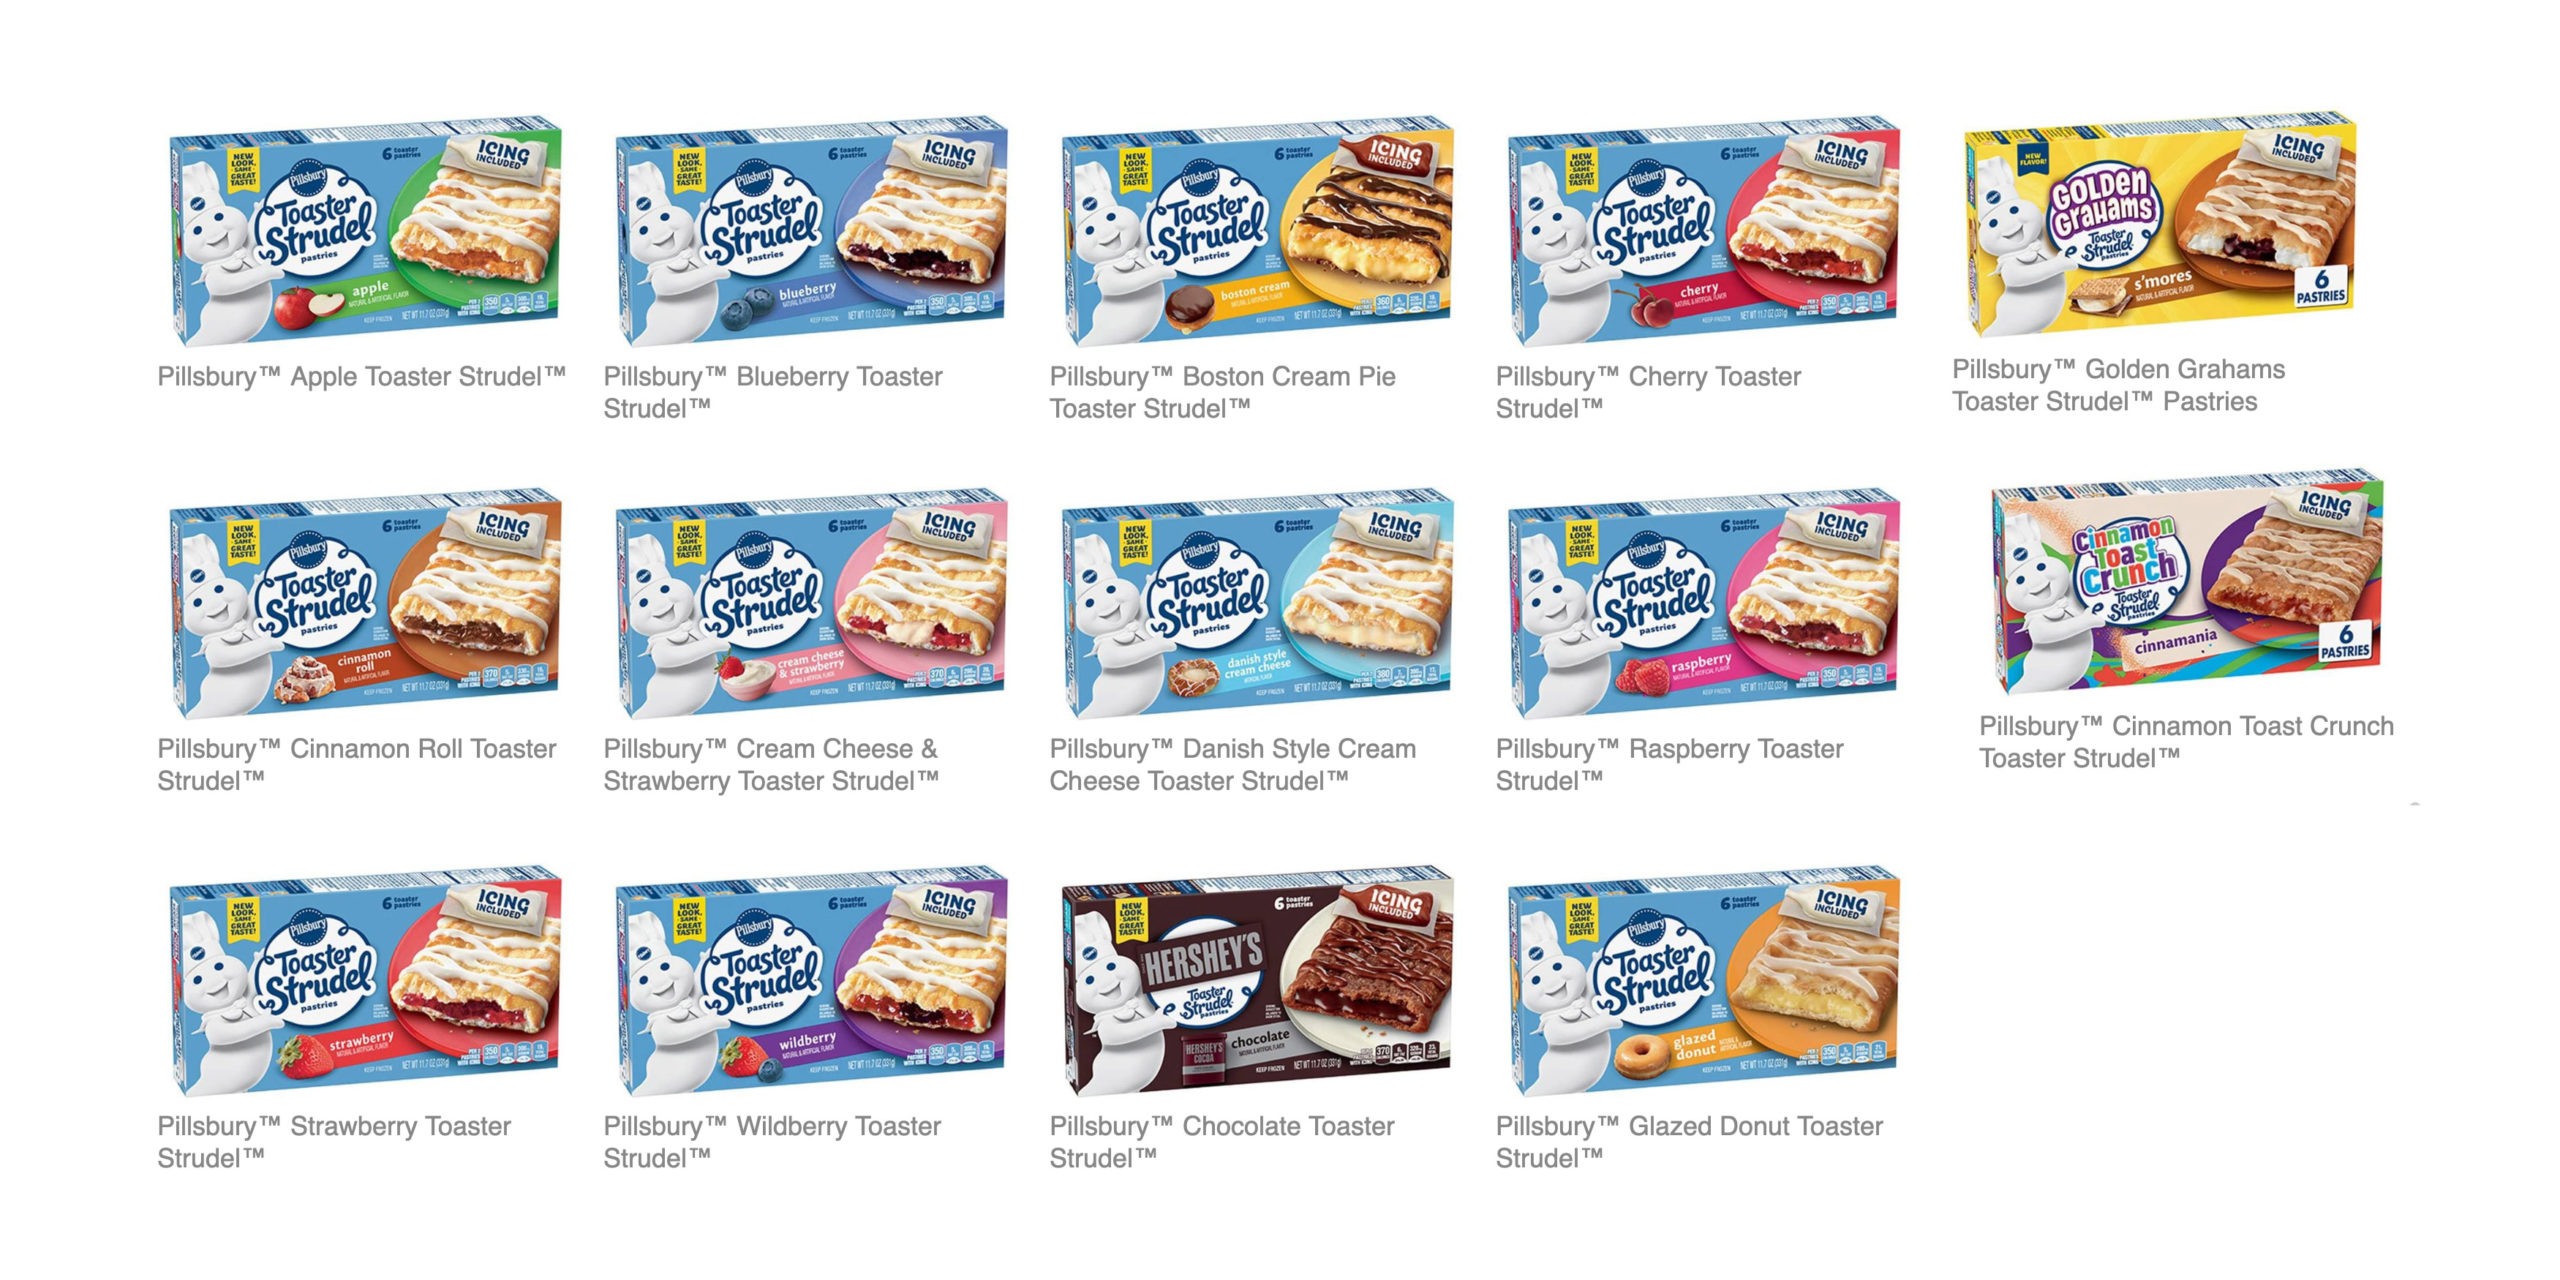 The fall 2020 varieties of Pillsbury Toaster Strudels